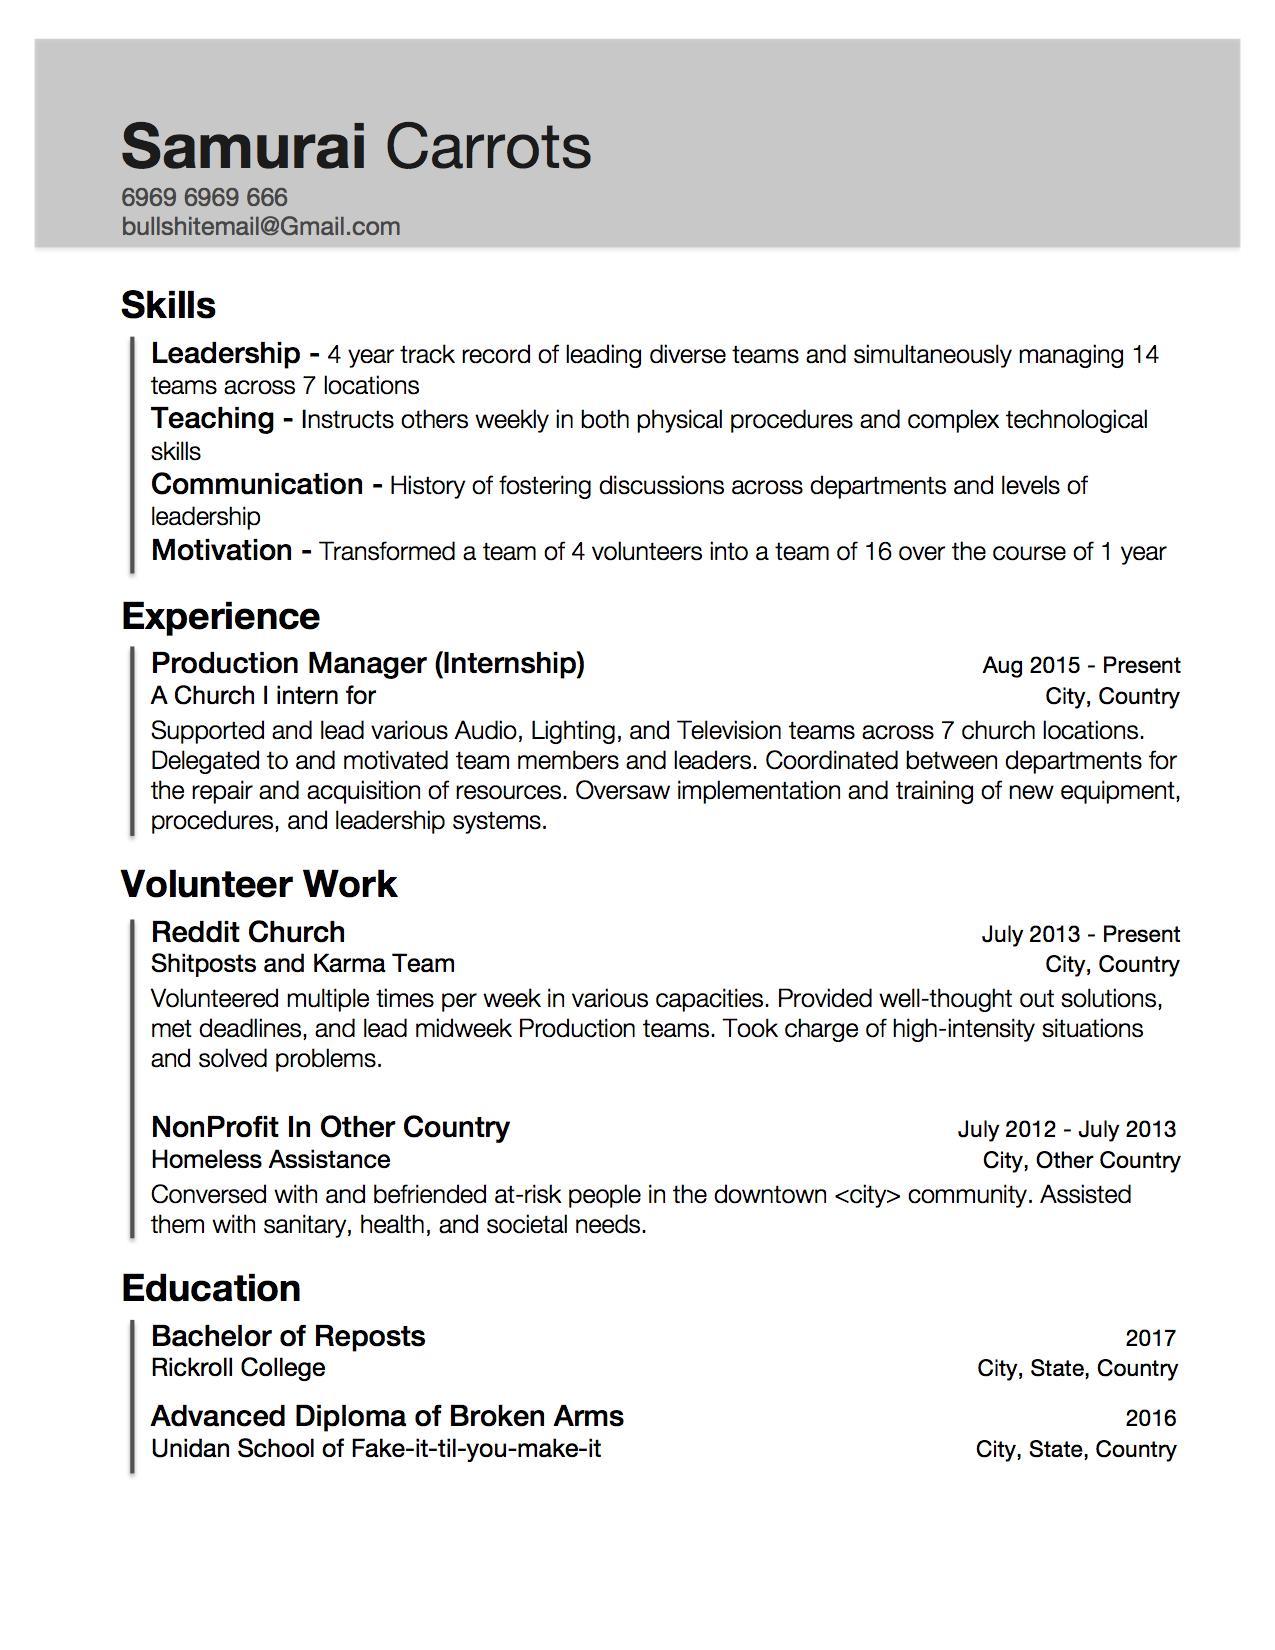 work skills to put on resumes